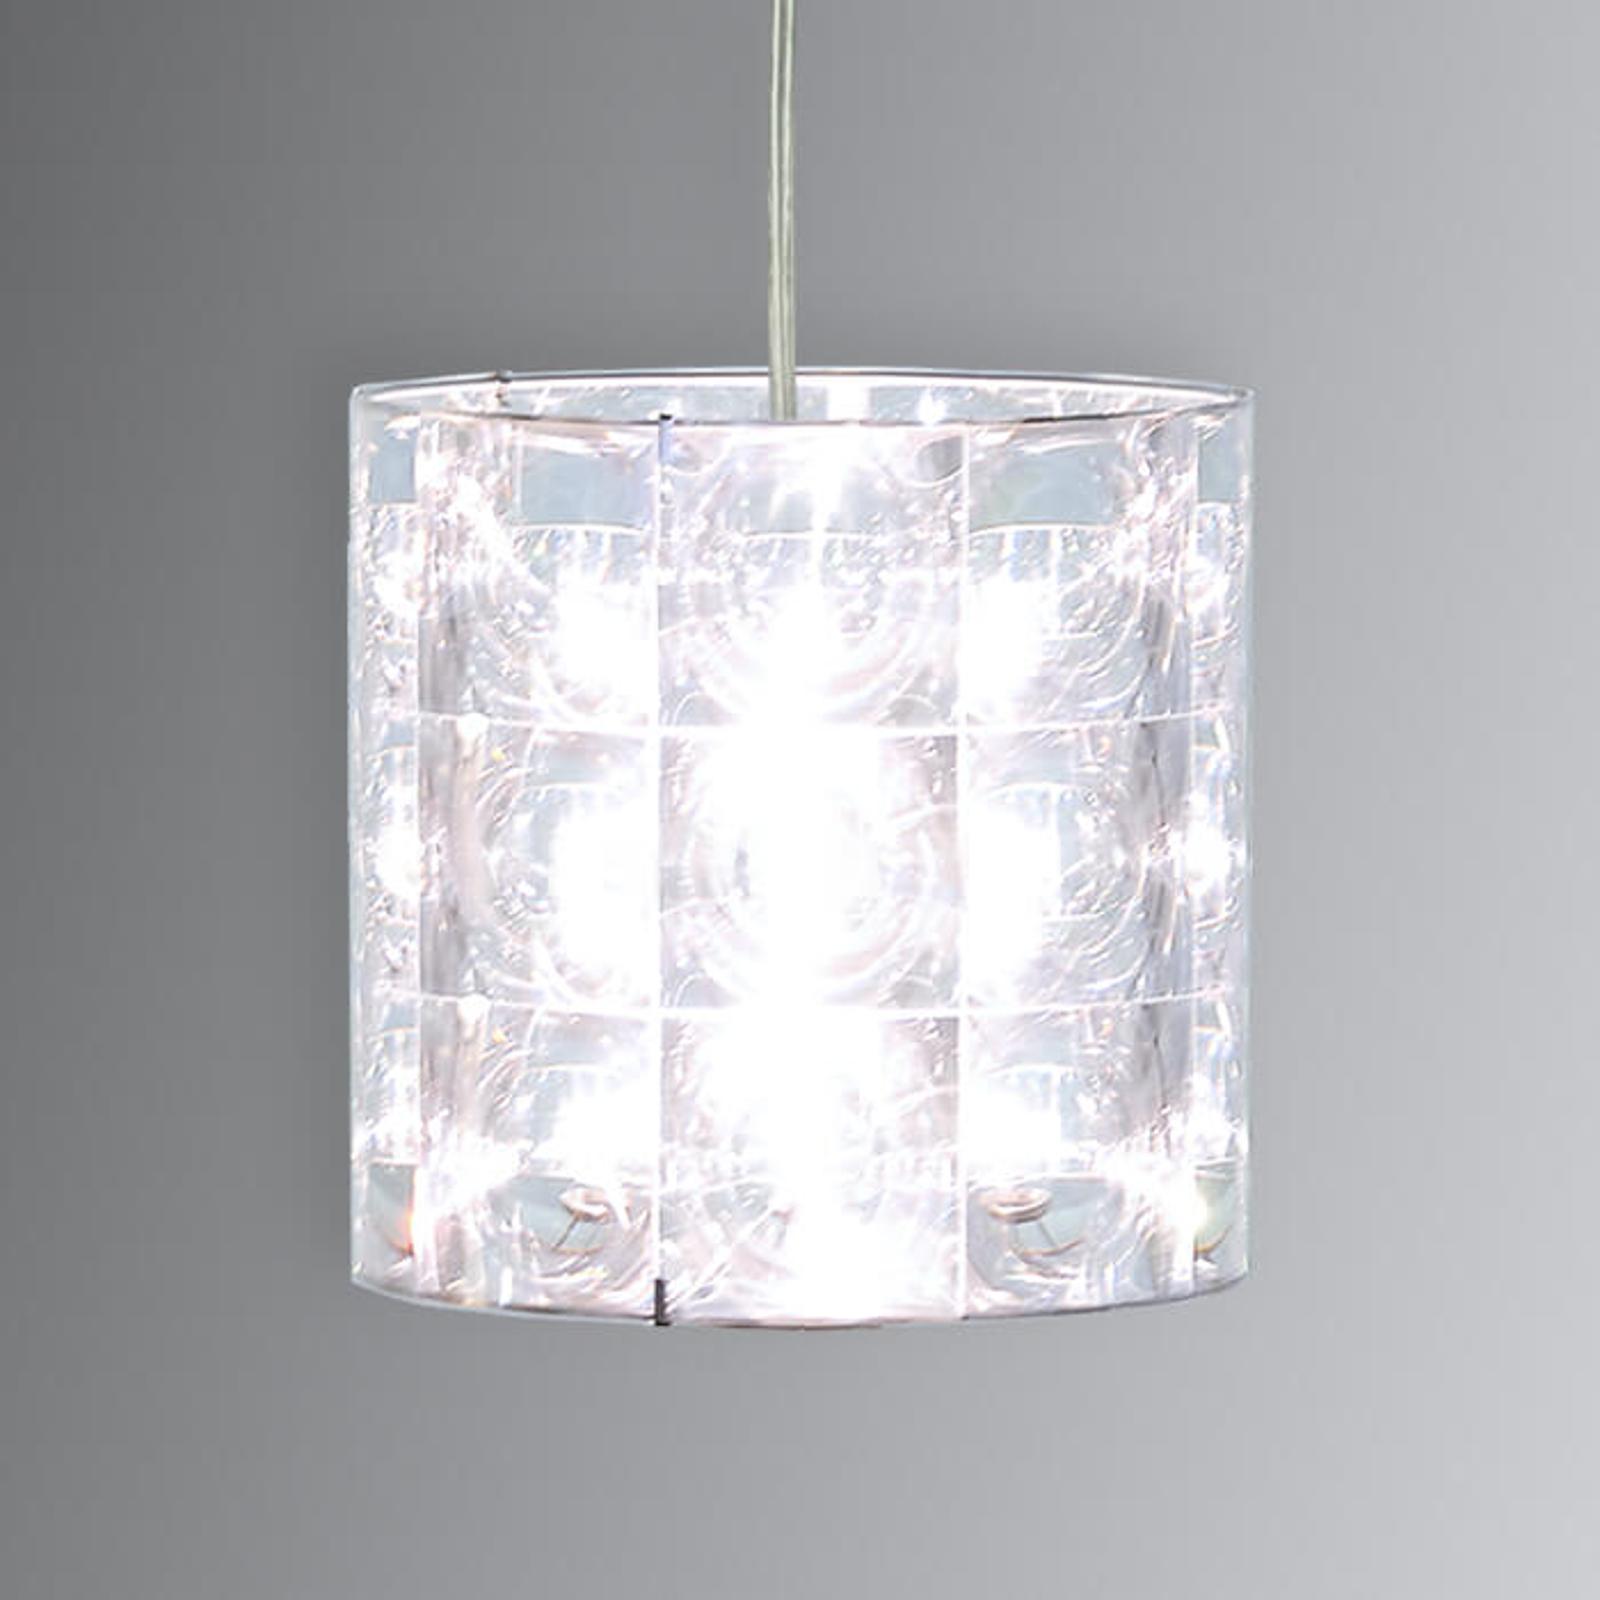 Innermost Lighthouse - design-hanglamp 30x30